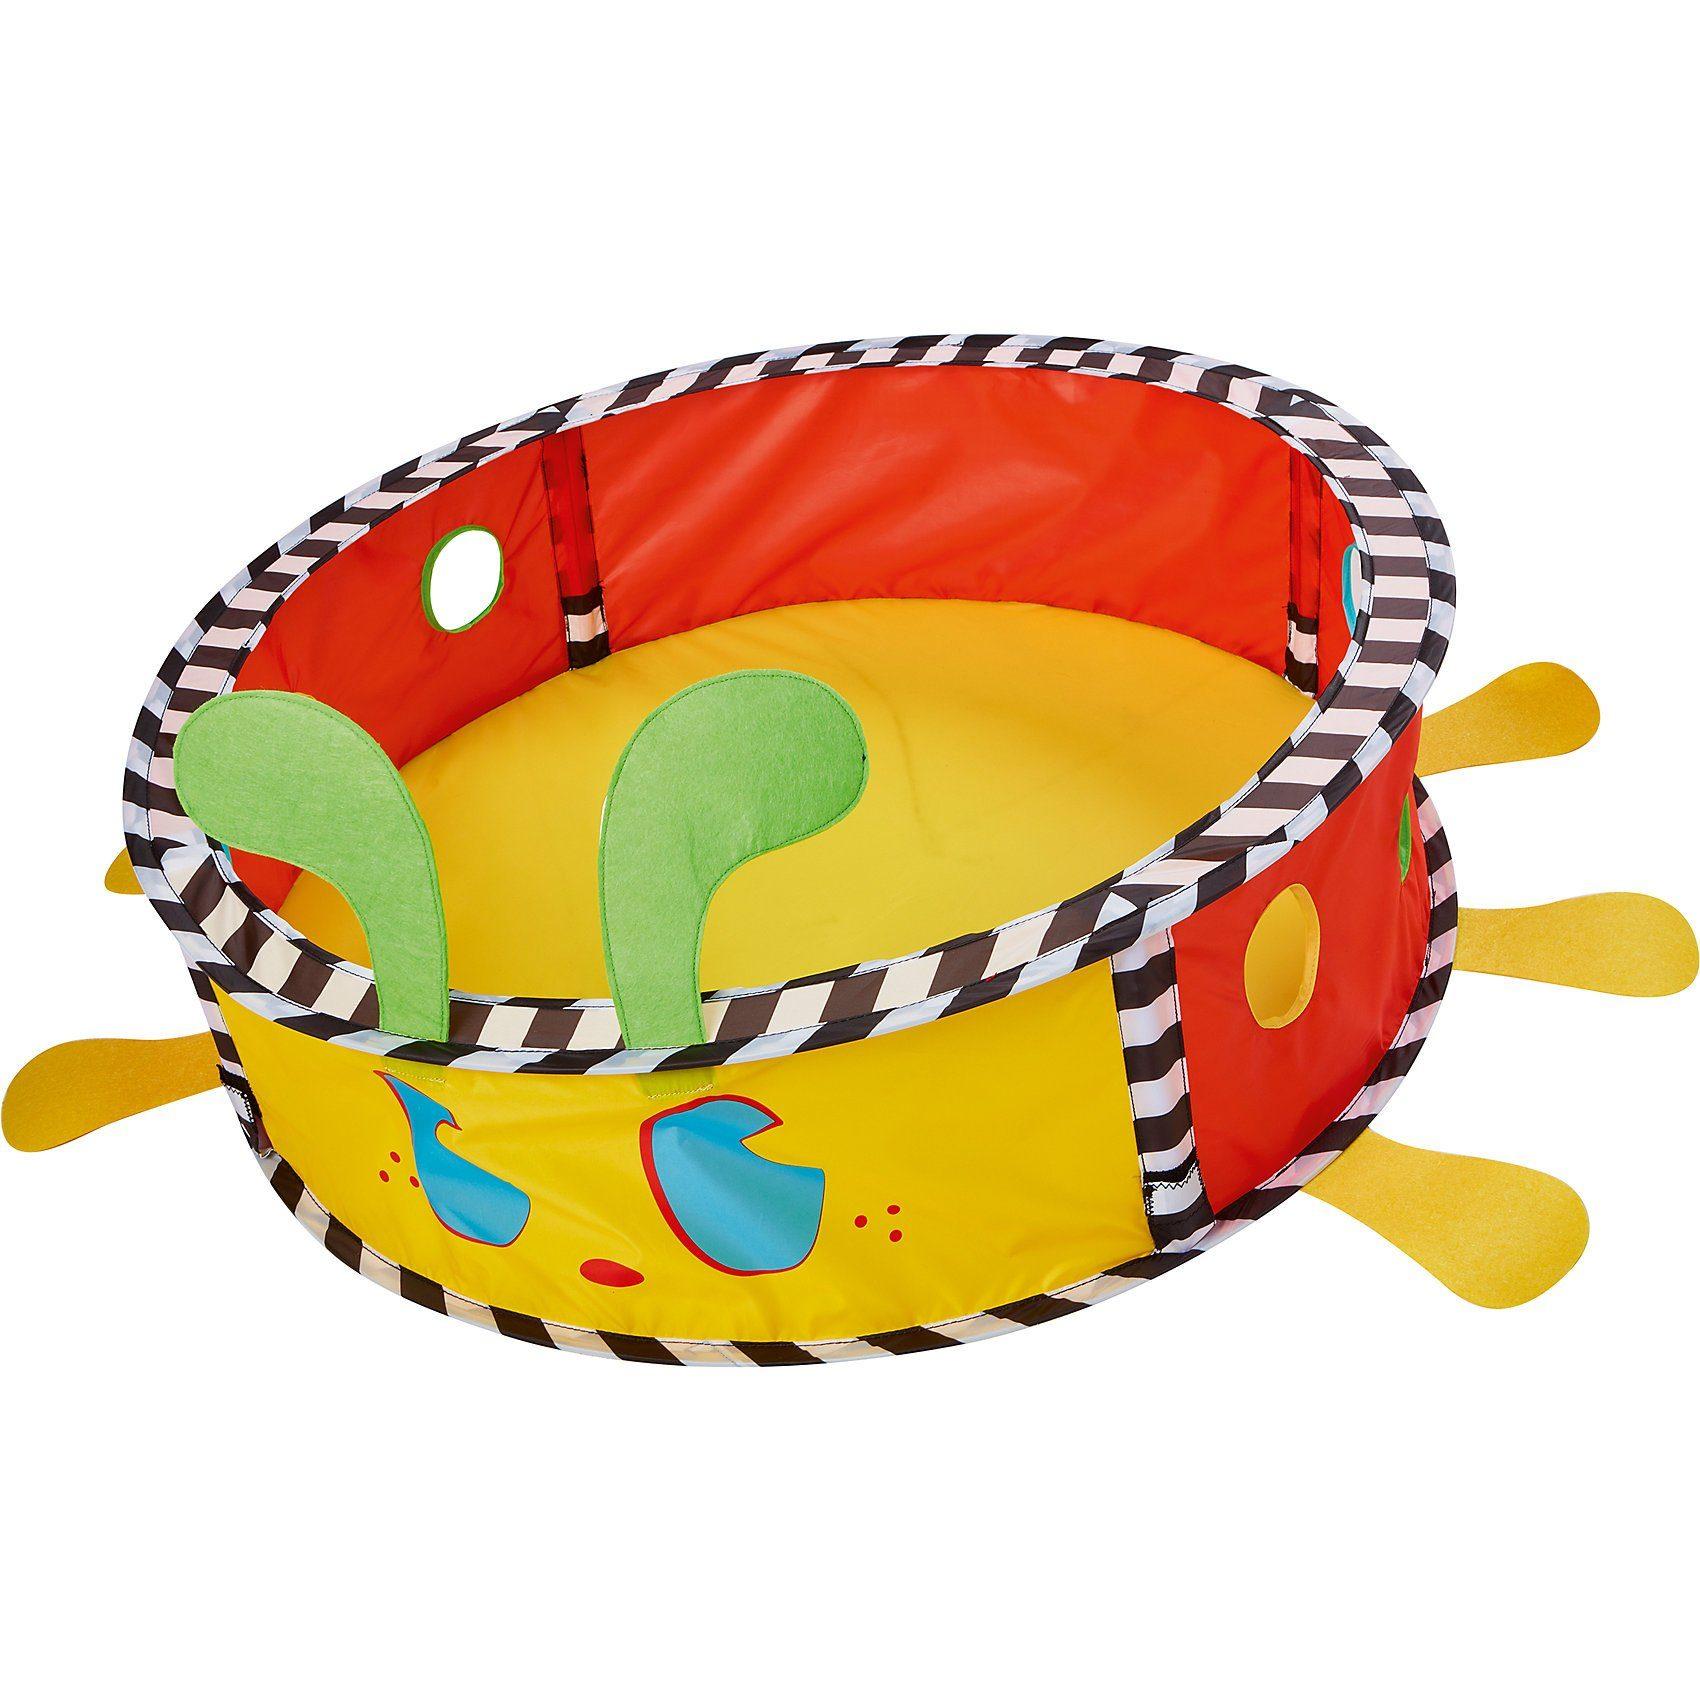 WORLDS APART Kinder Bällebad Ladybird Pop-Up